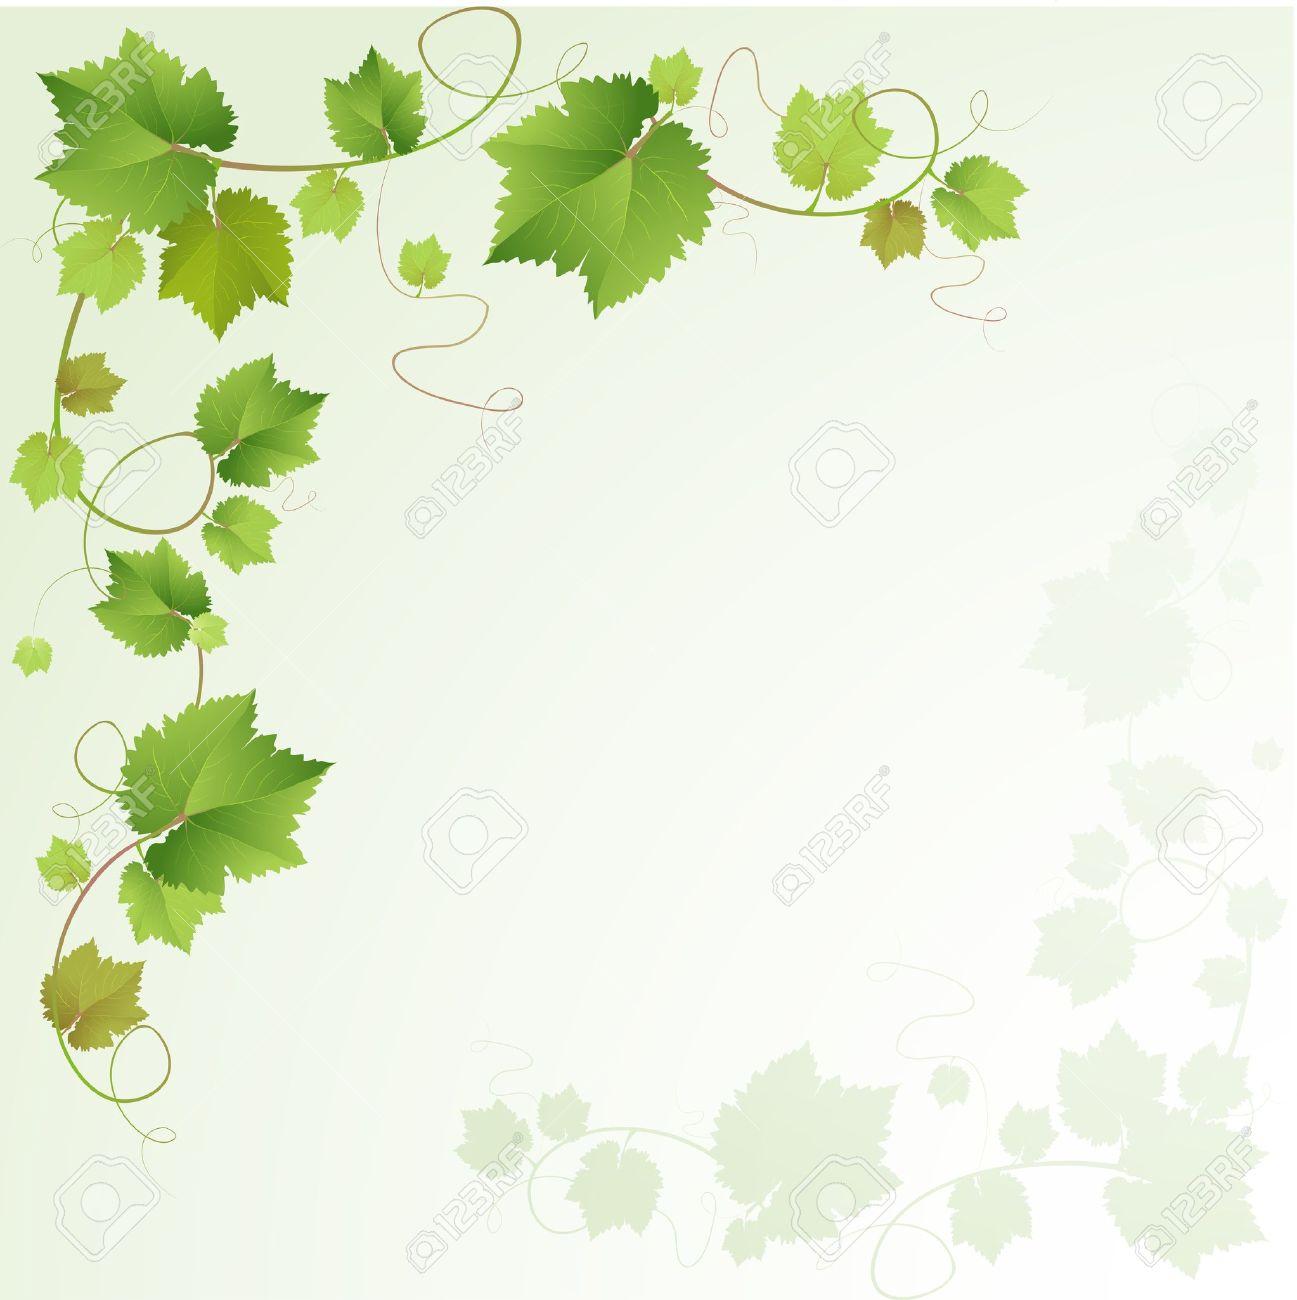 Grapes vine background Stock Vector - 14291688